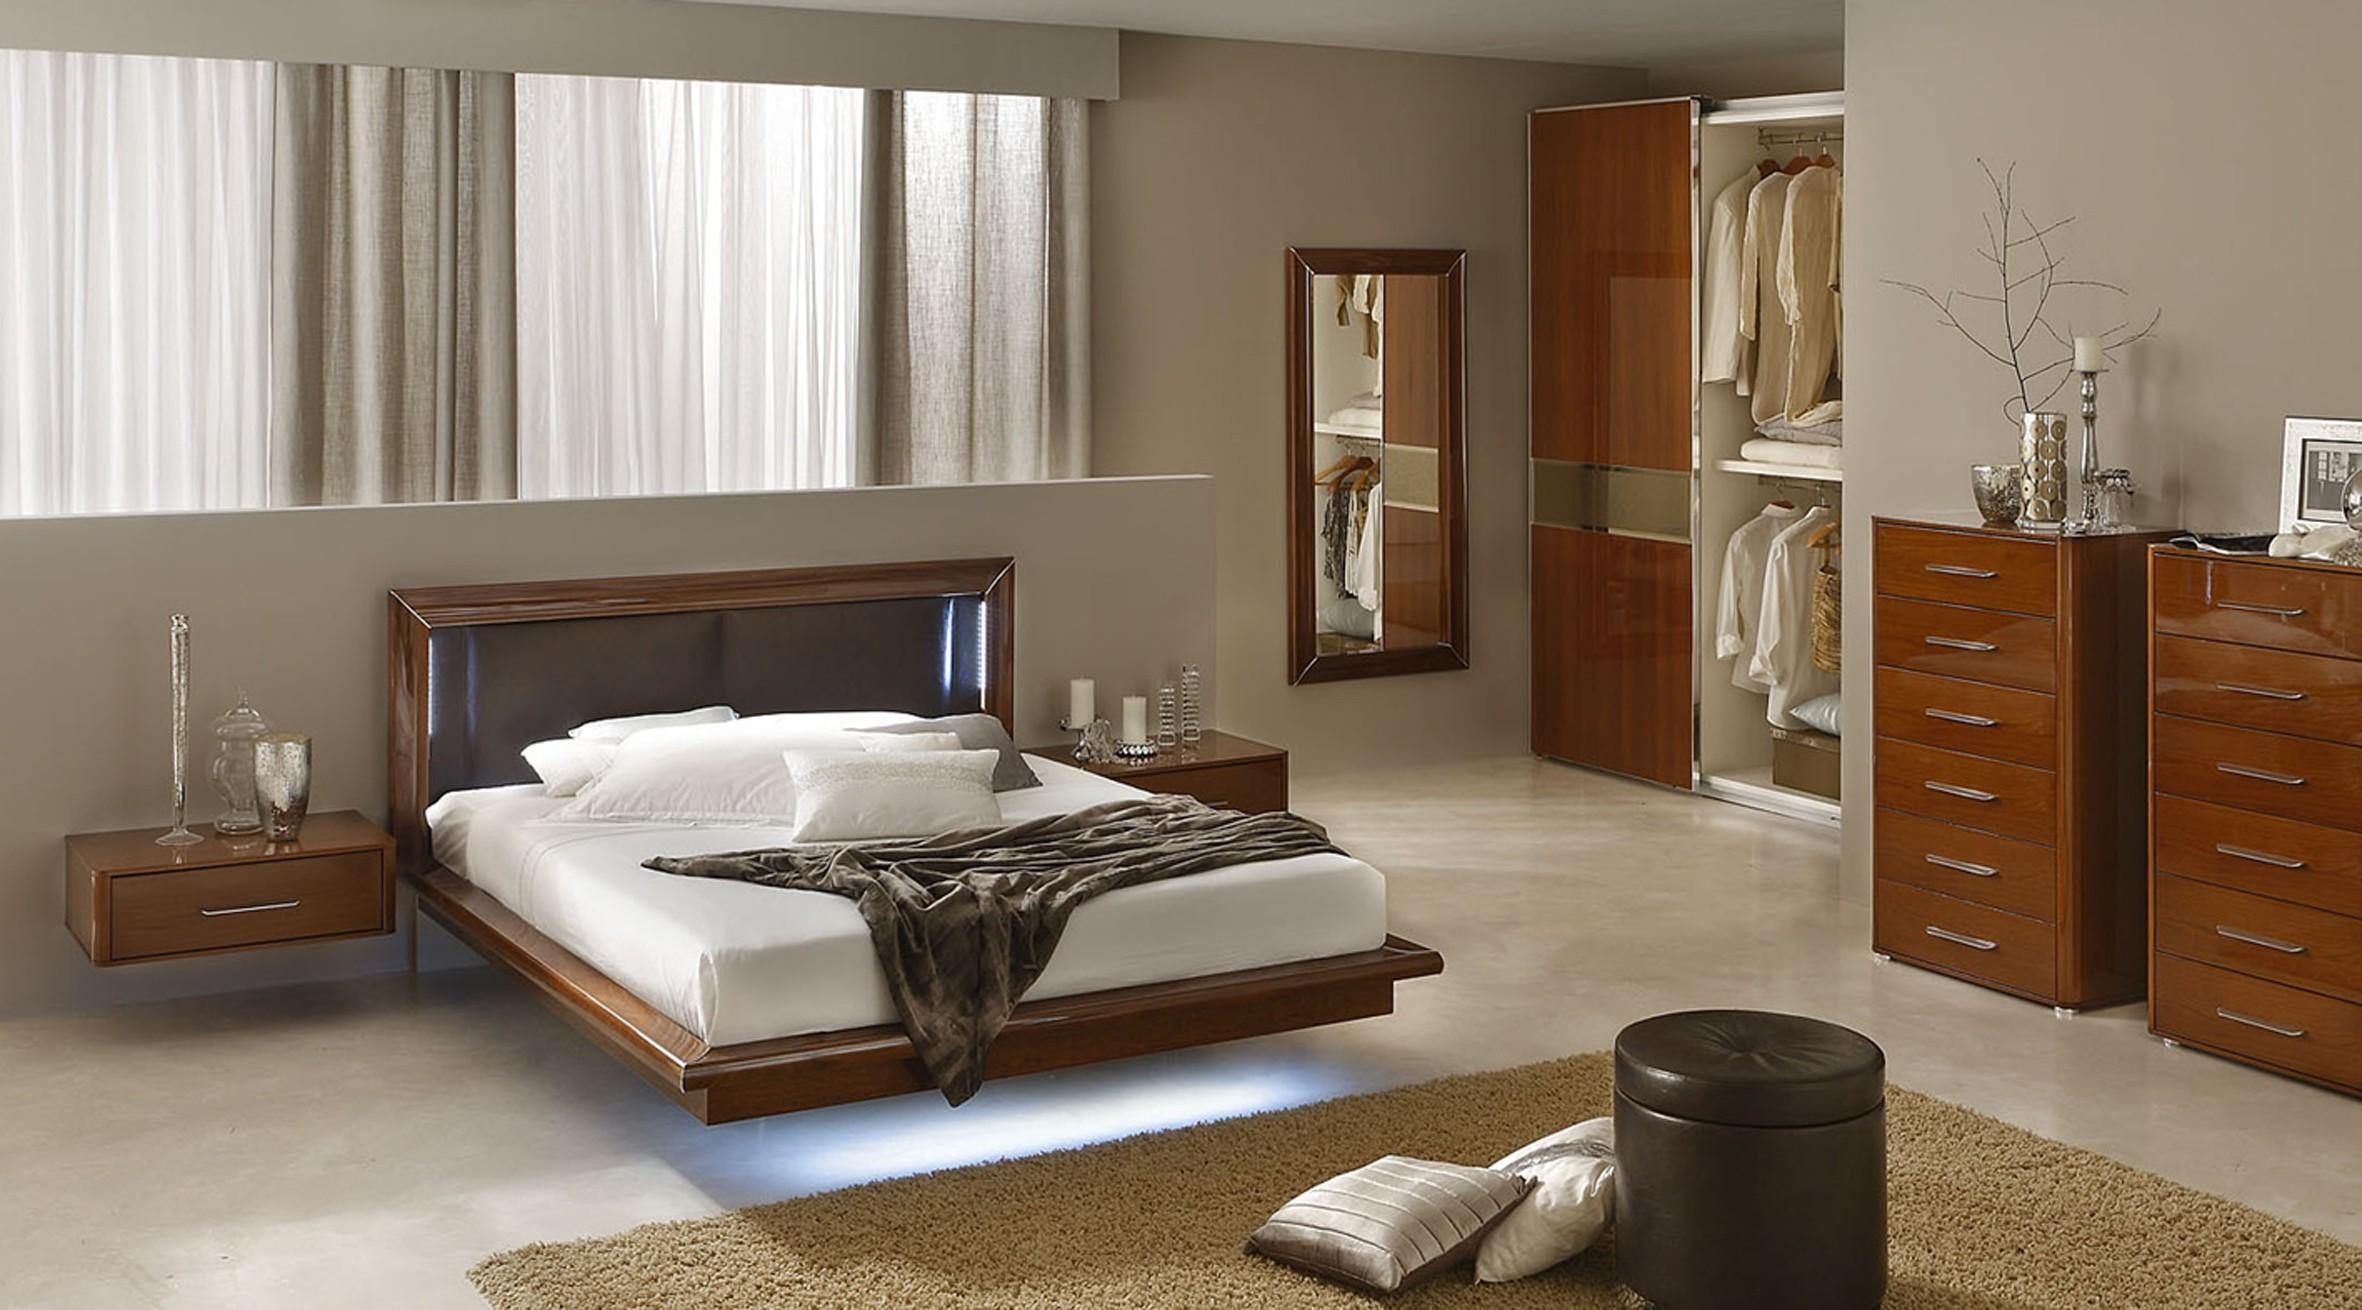 modern bedroom furniture sets modern italian bedroom furniture sets hawk haven 16276 | modern italian bedroom furniture sets 3 1365